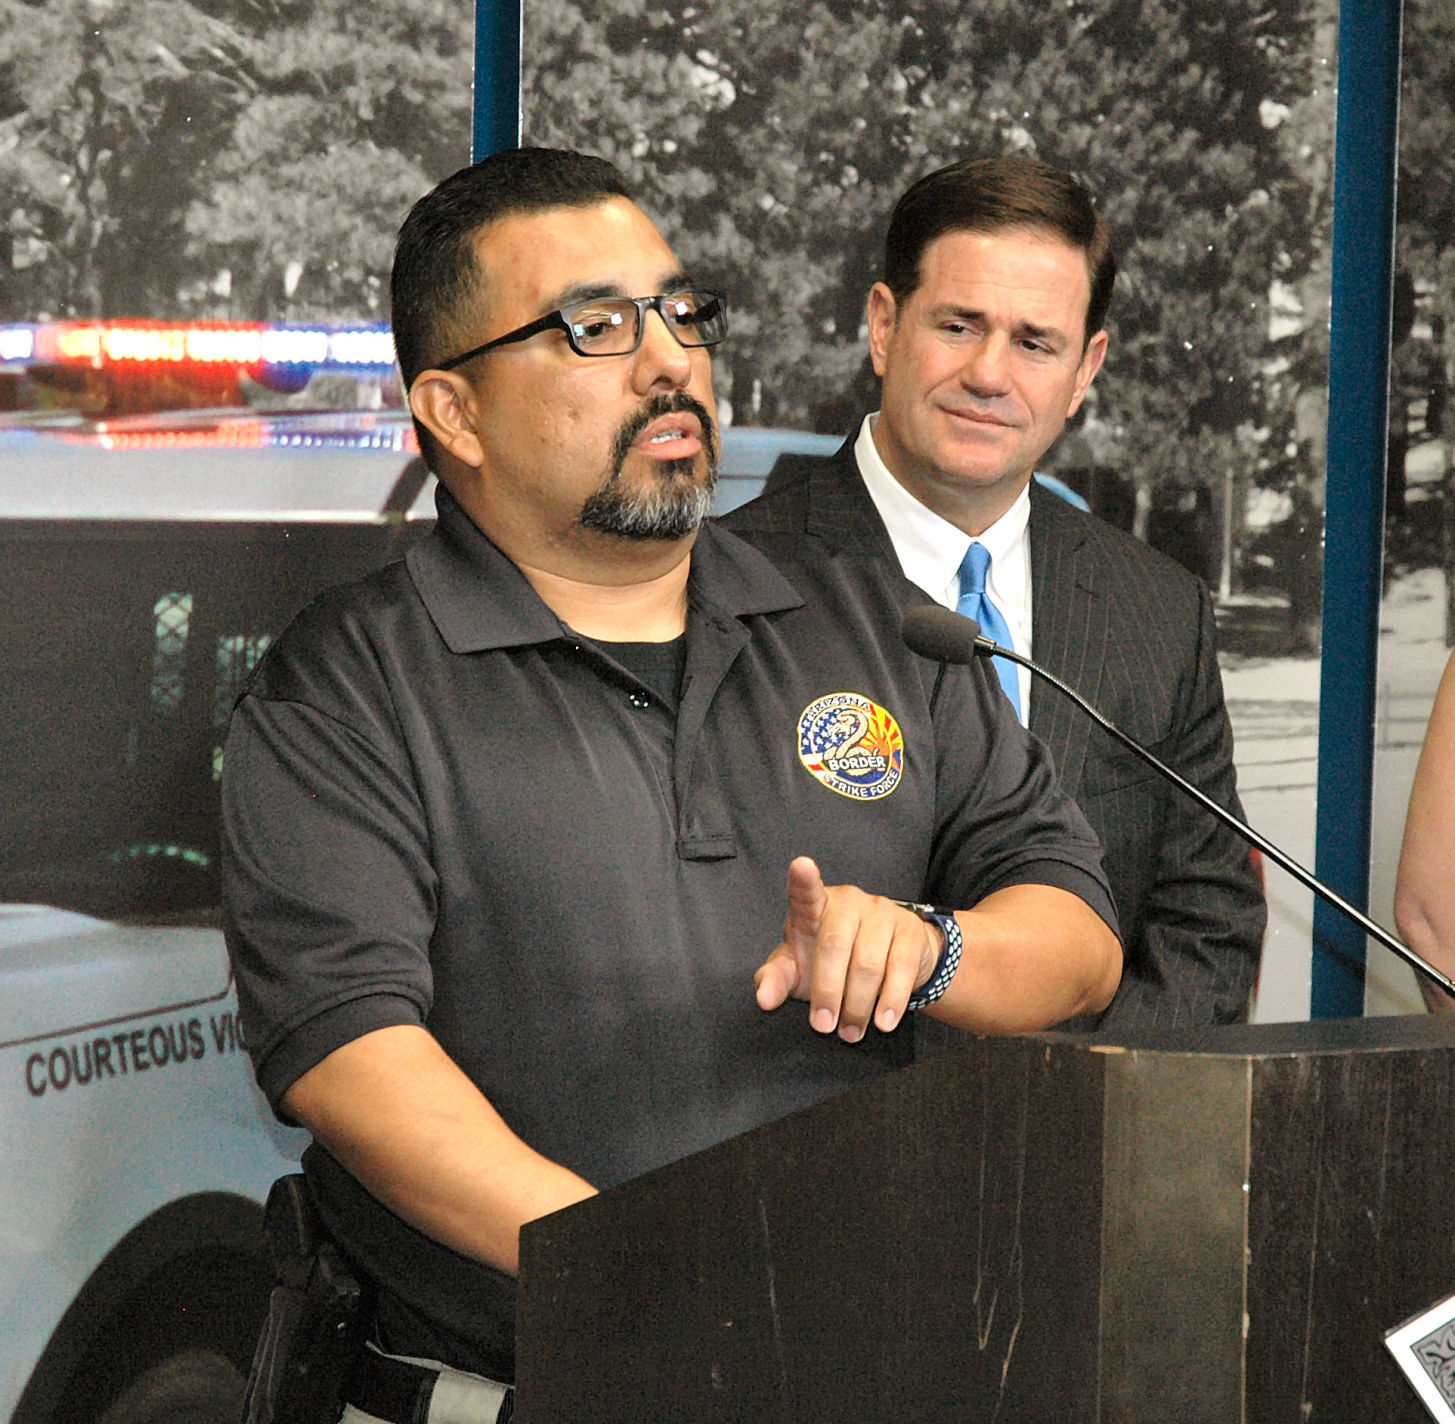 Despite no drop in overdoses, Gov. Doug Ducey says progress being made against Arizona opioid crisis | Tucson.com